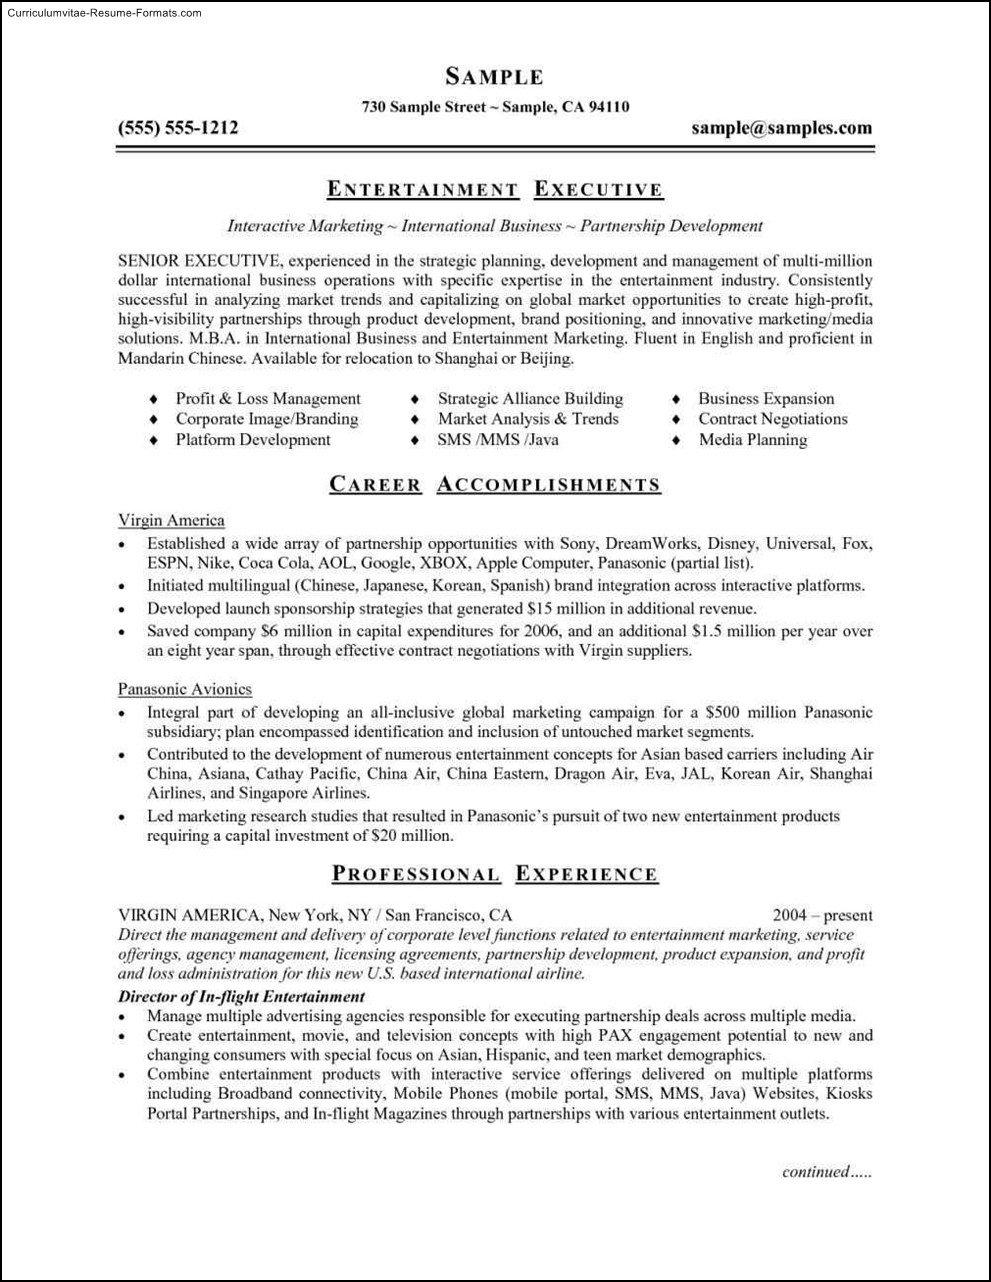 Resume Template Microsoft Word 2007 Resume Curriculumvitae